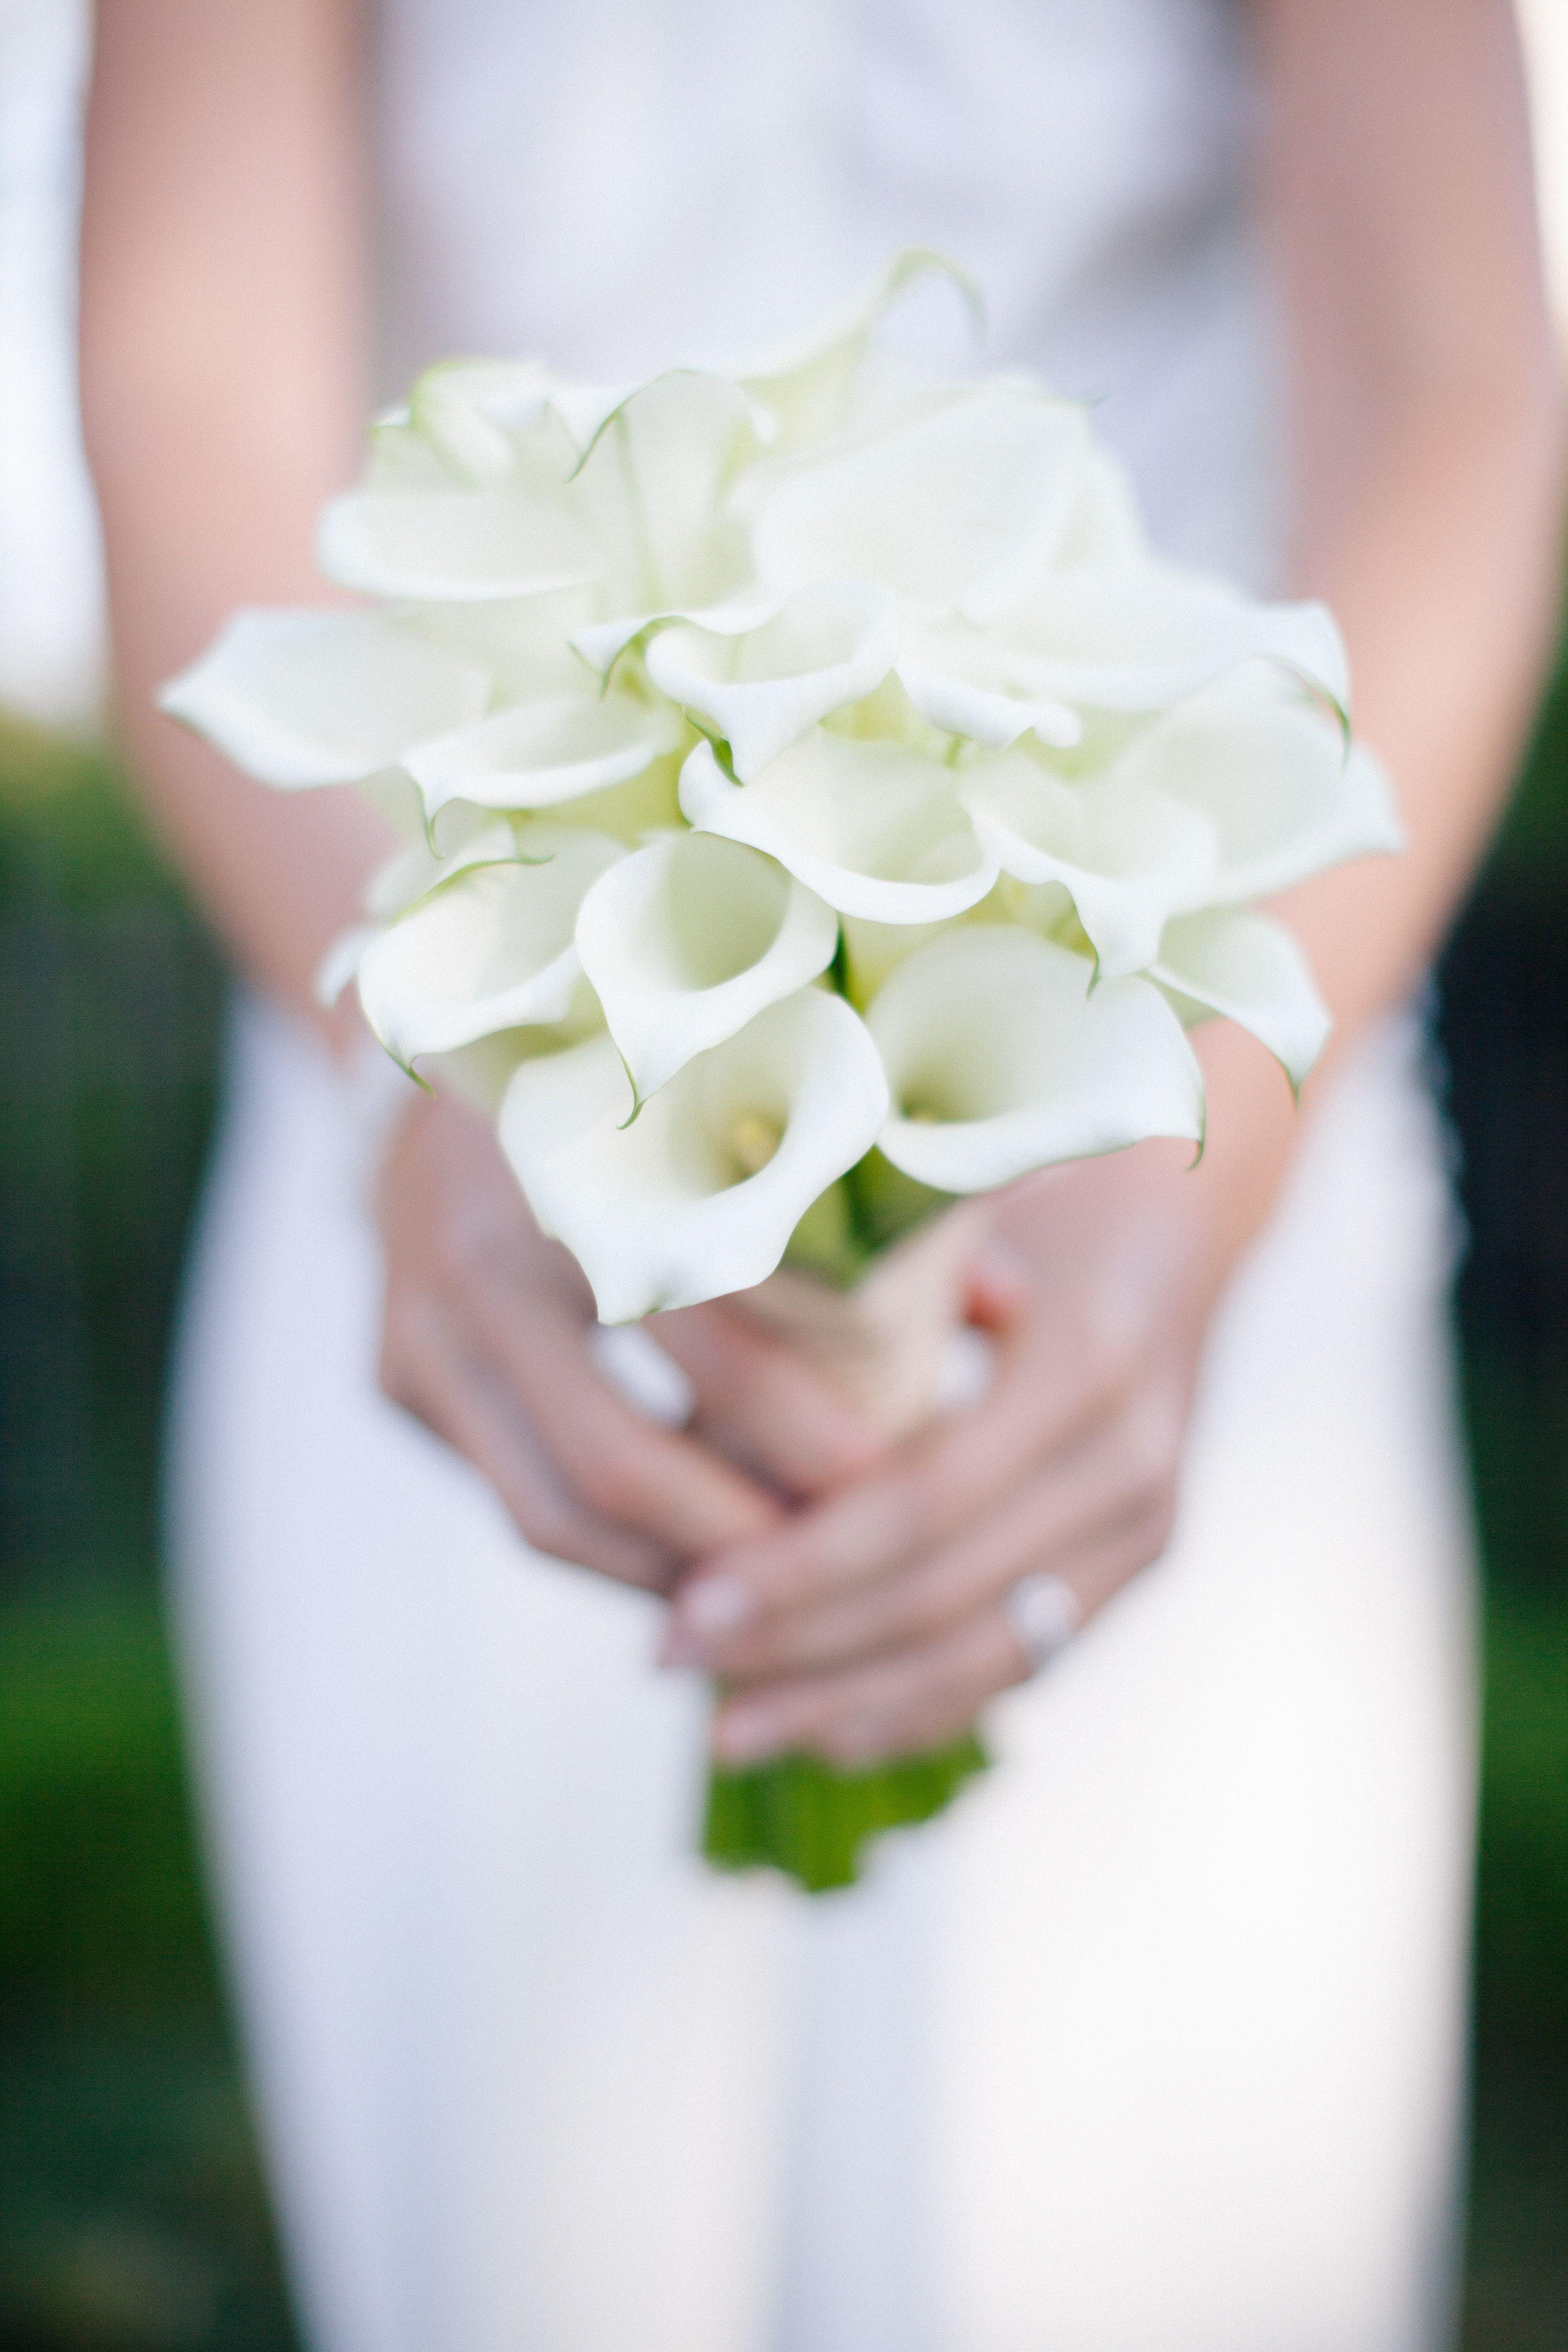 White Calla Lily Bridal Bouquet Flower Wild Annie Mcelwain Photography Theknot Com Wedding Flower Alternatives Wedding Flowers White Calla Lily Bouquet